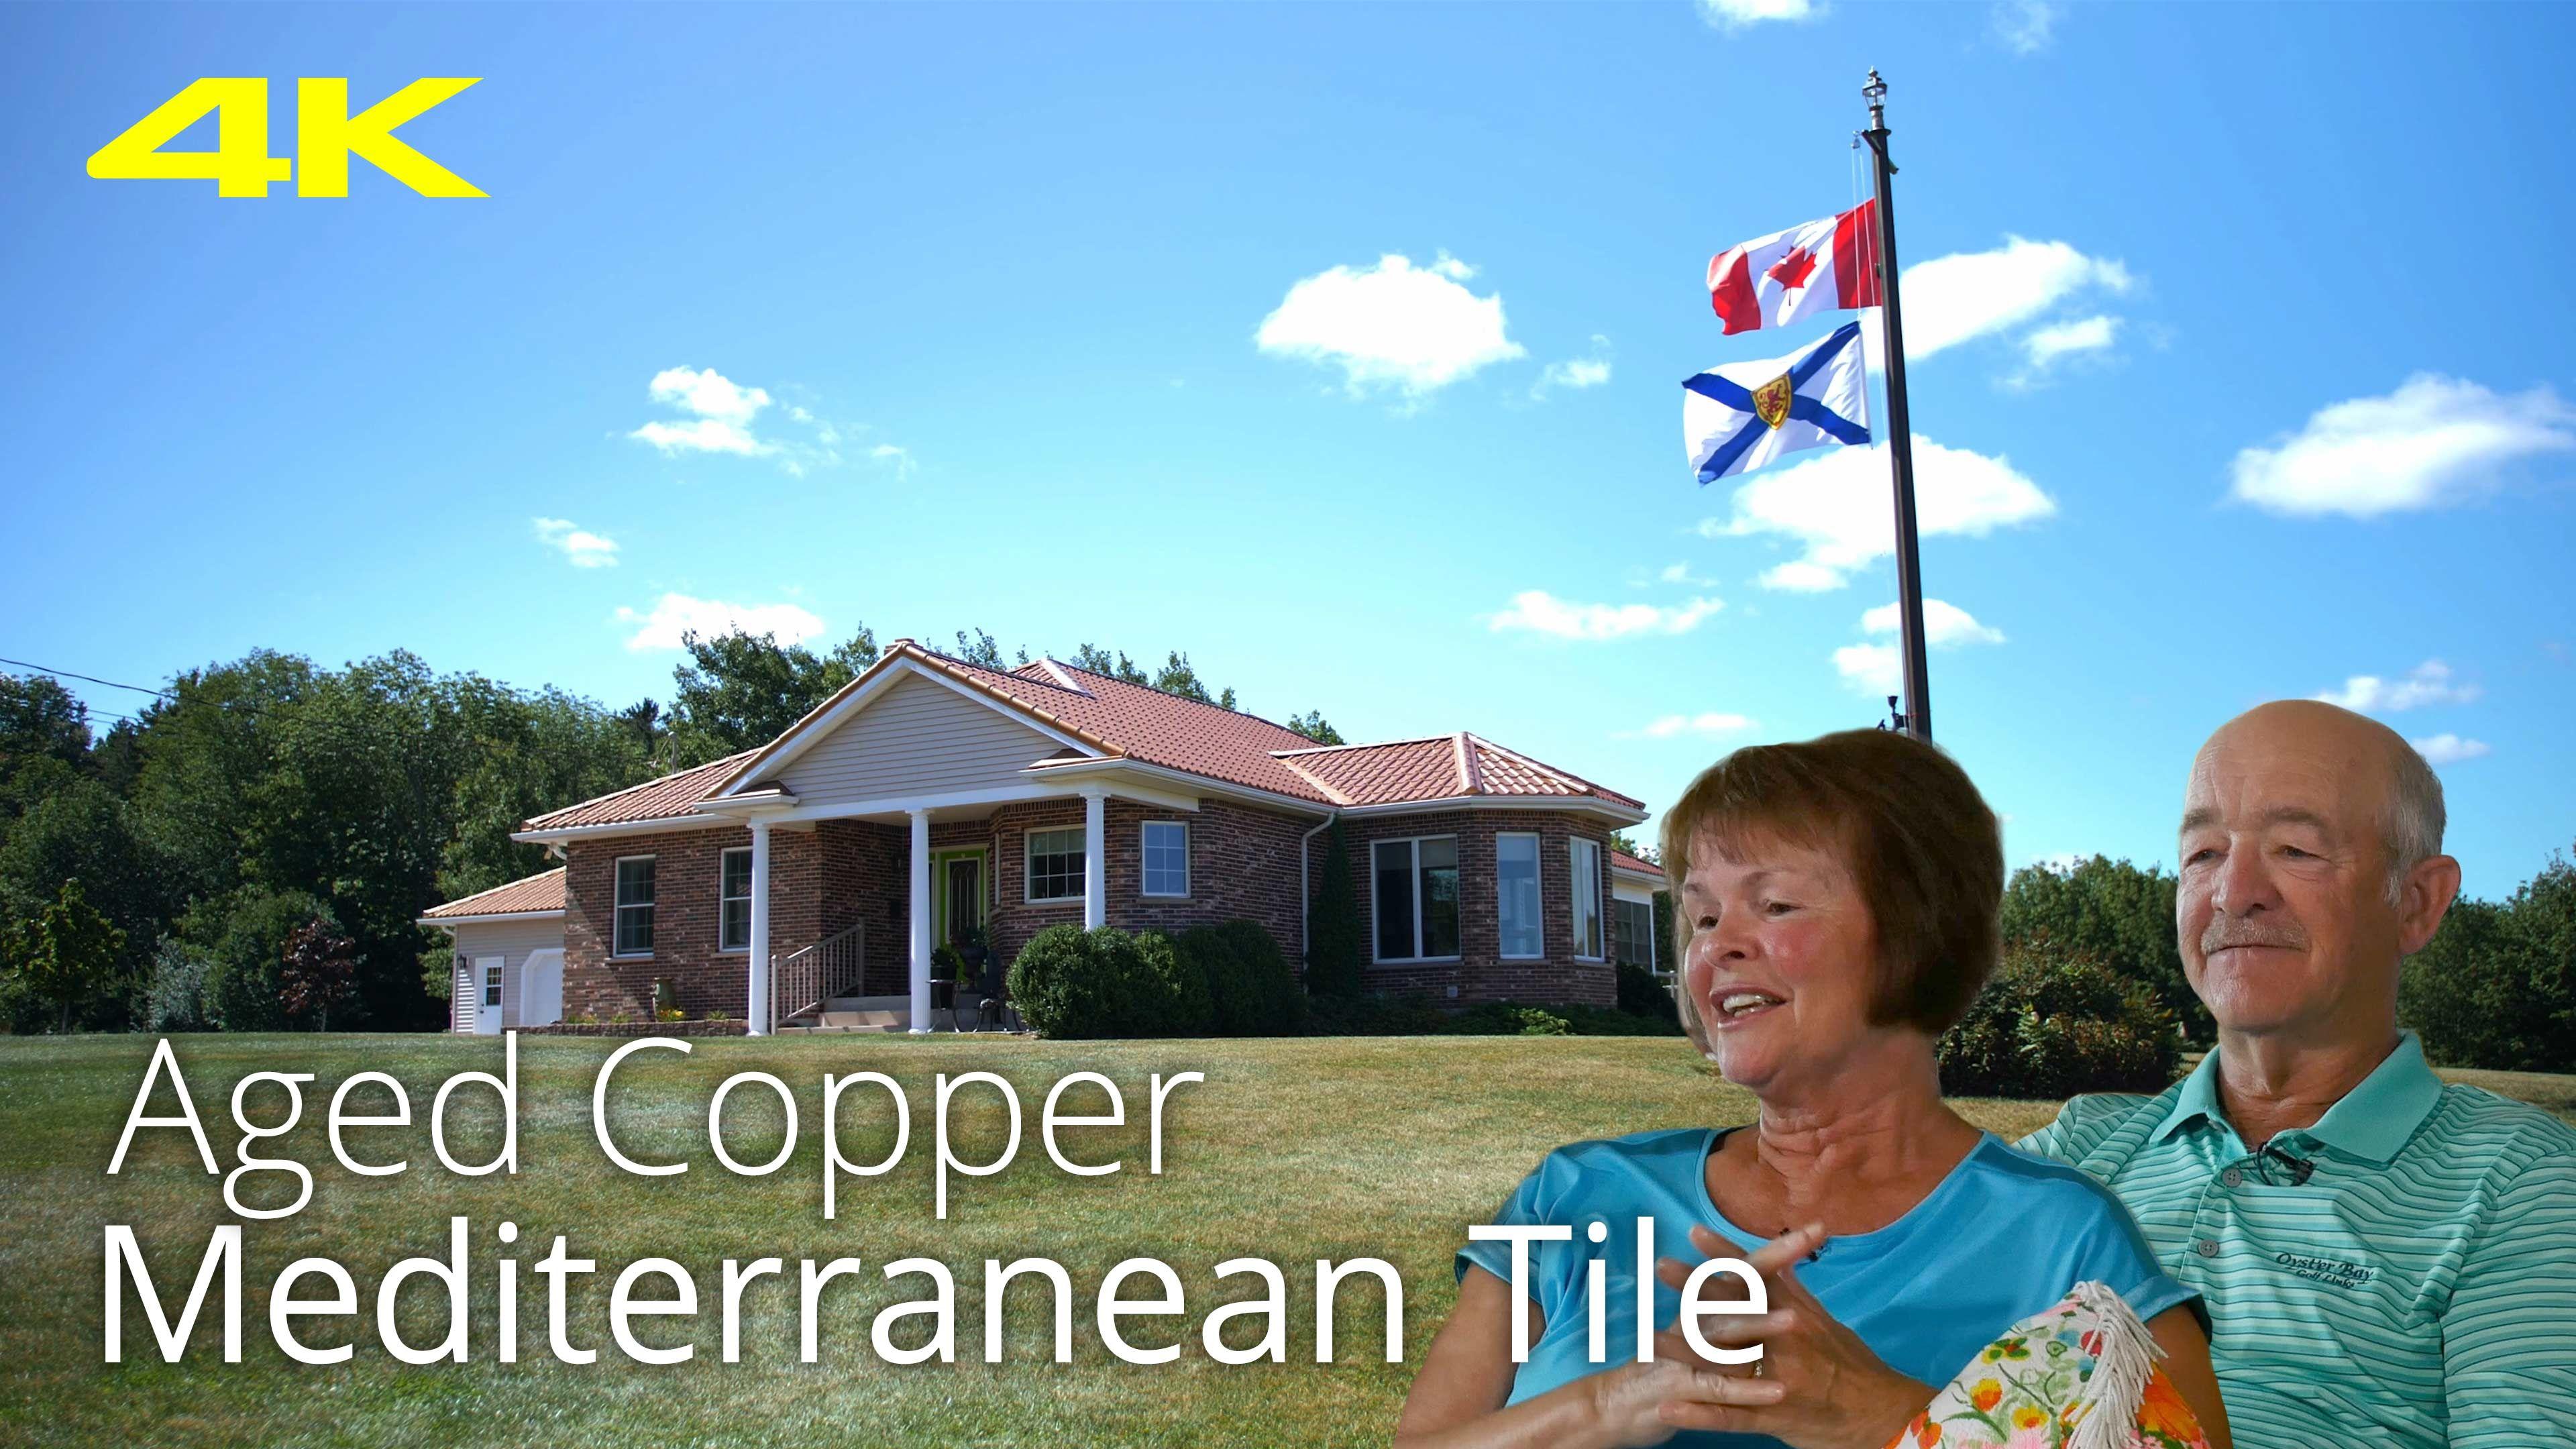 Aged Copper Mediterranean Tile Interlock Metal Roof Coldbrook Nova Scotia Canada Mediterranean Tile Nova Scotia Aged Copper